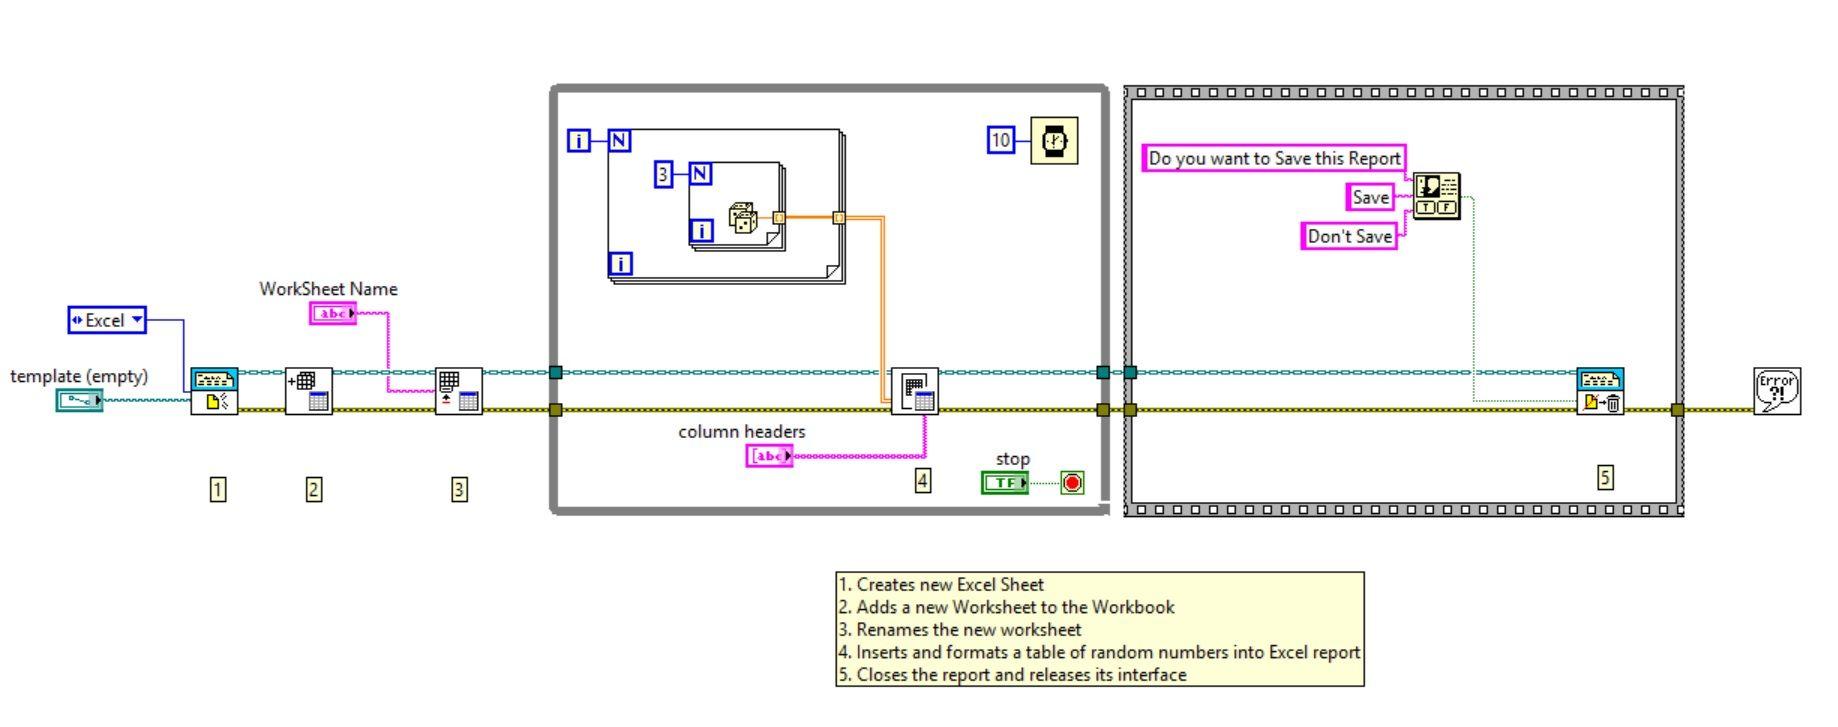 Workbooks excel workbook save : Add Excel Worksheet to Workbook Using LabVIEW - Discussion Forums ...